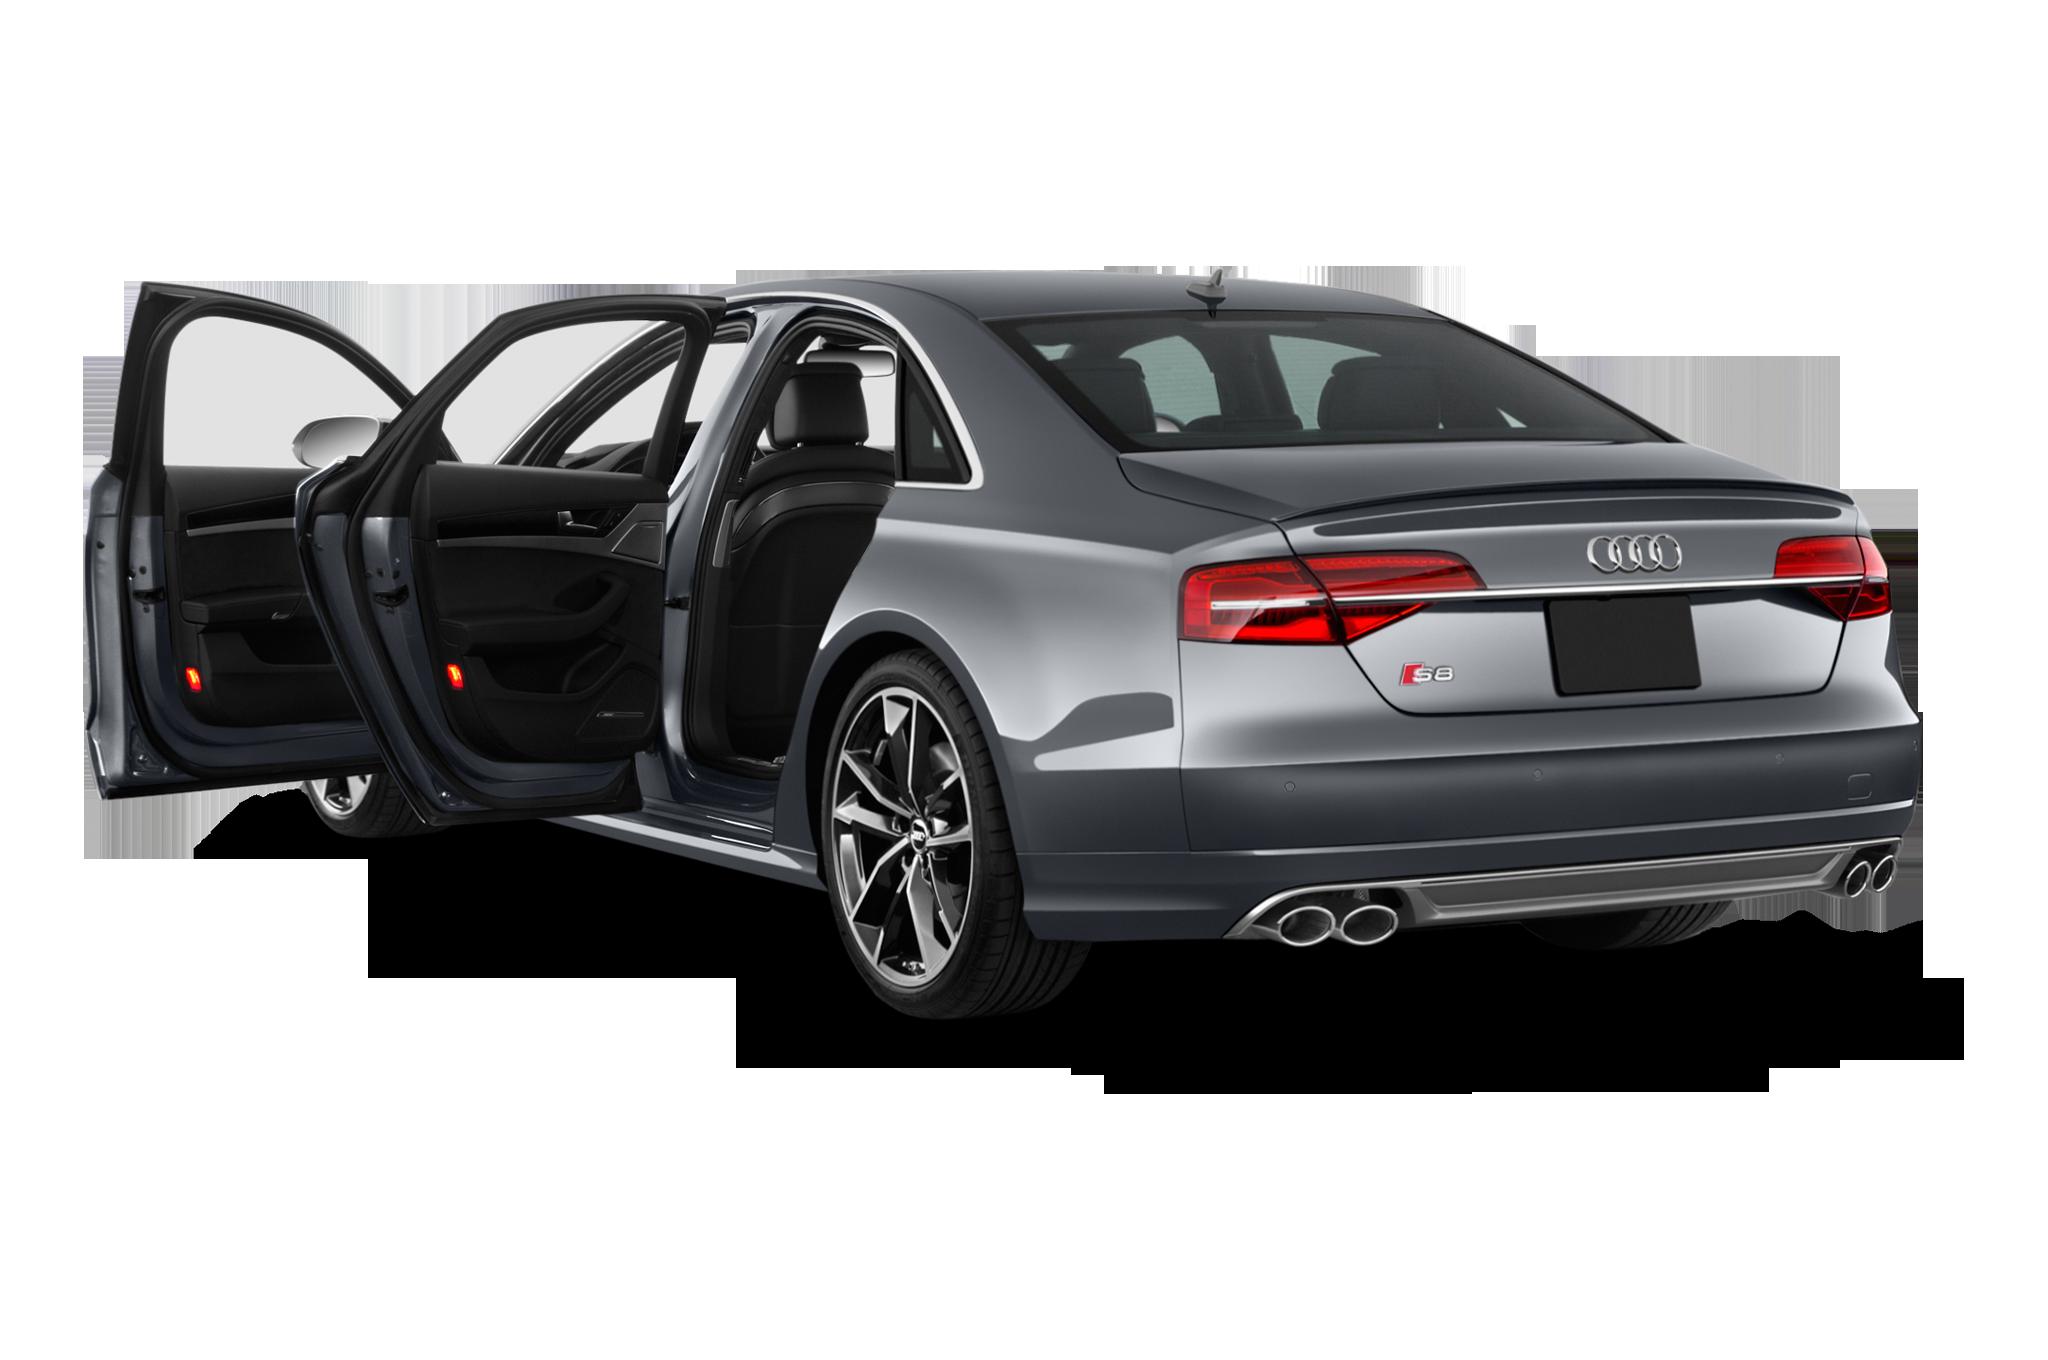 Audi S Plus One Week Review Automobile Magazine - Audi car models 2016